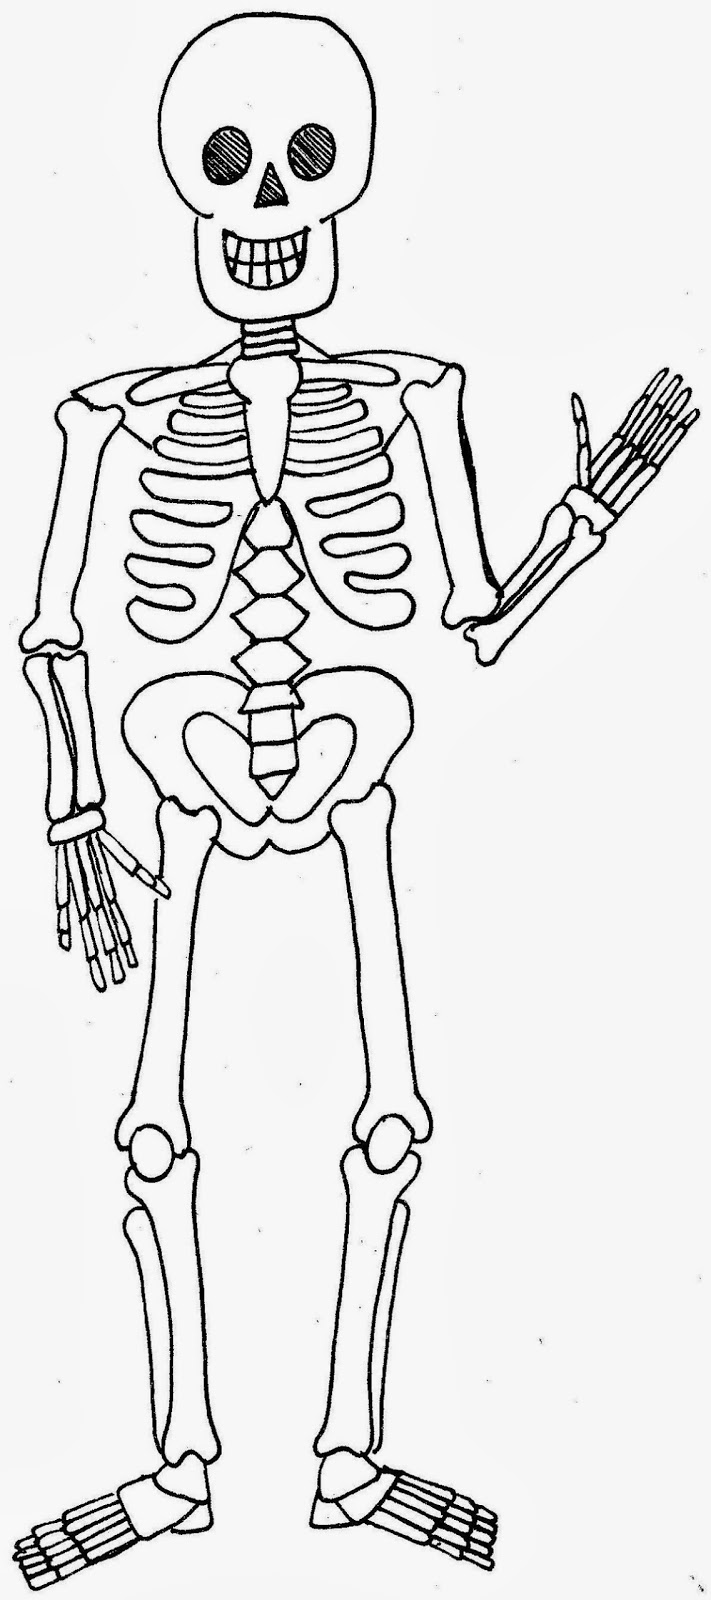 hight resolution of human body skeleton diagram rachael edwards dog skeleton diagram blank dog anatomy skeleton